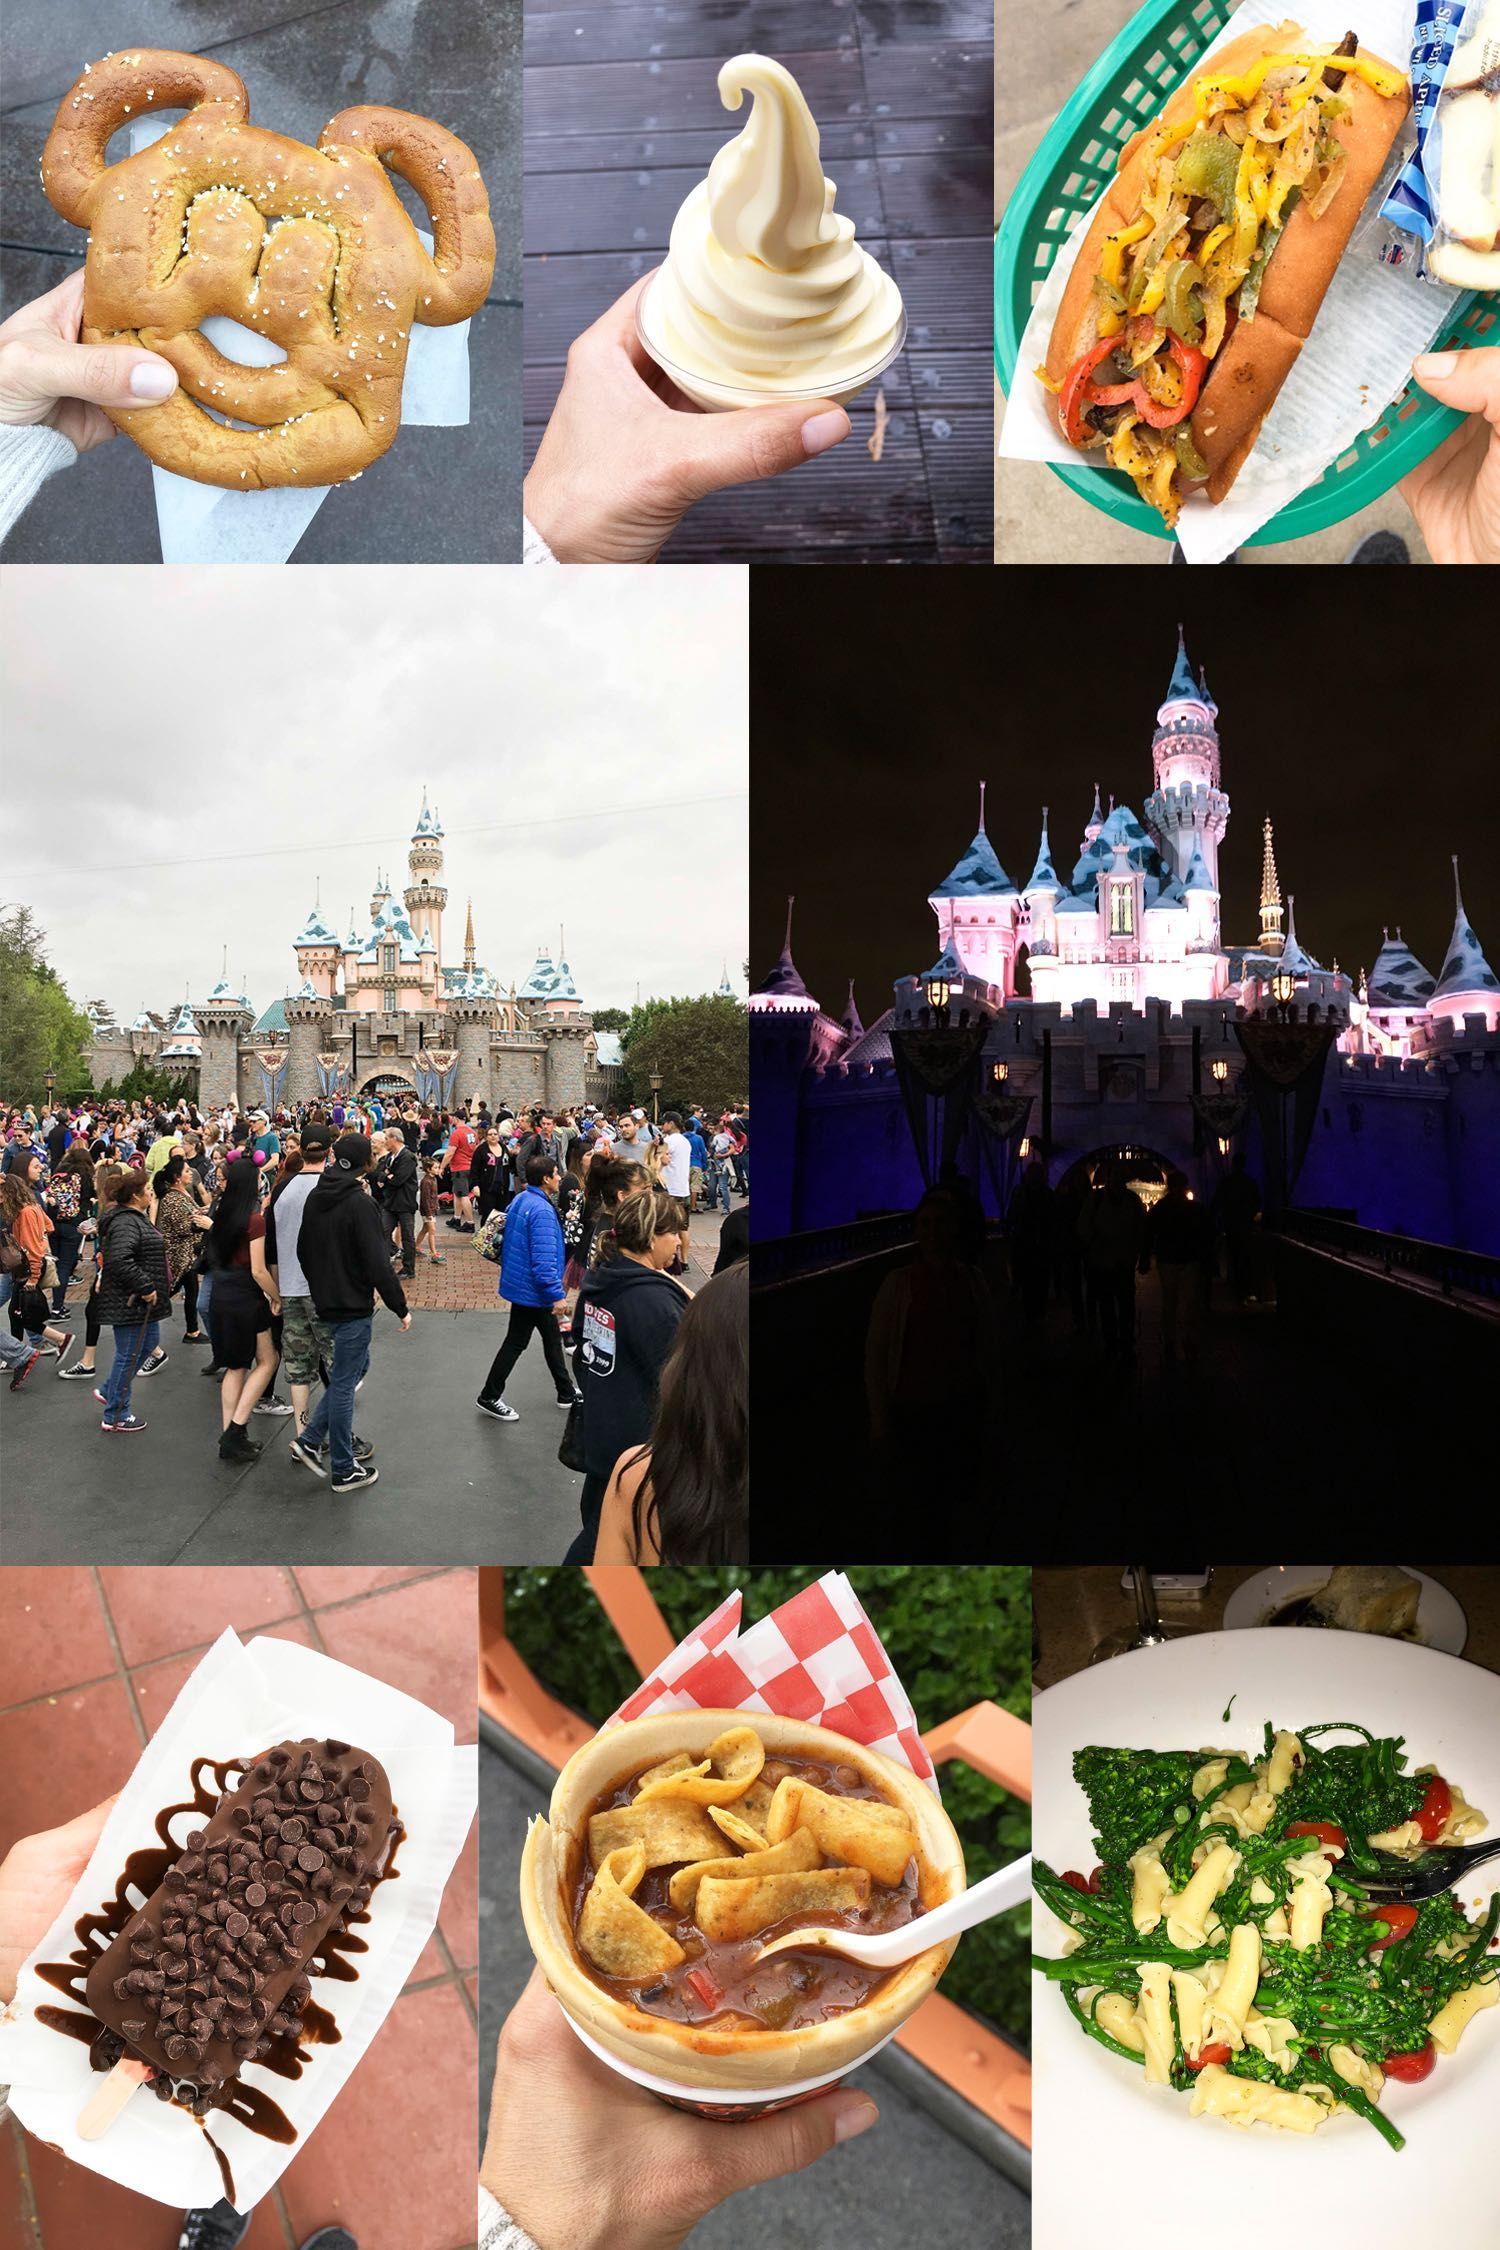 Vegan Food At Disneyland And California Adventure Disneyland Food Food Dairy Free Snacks